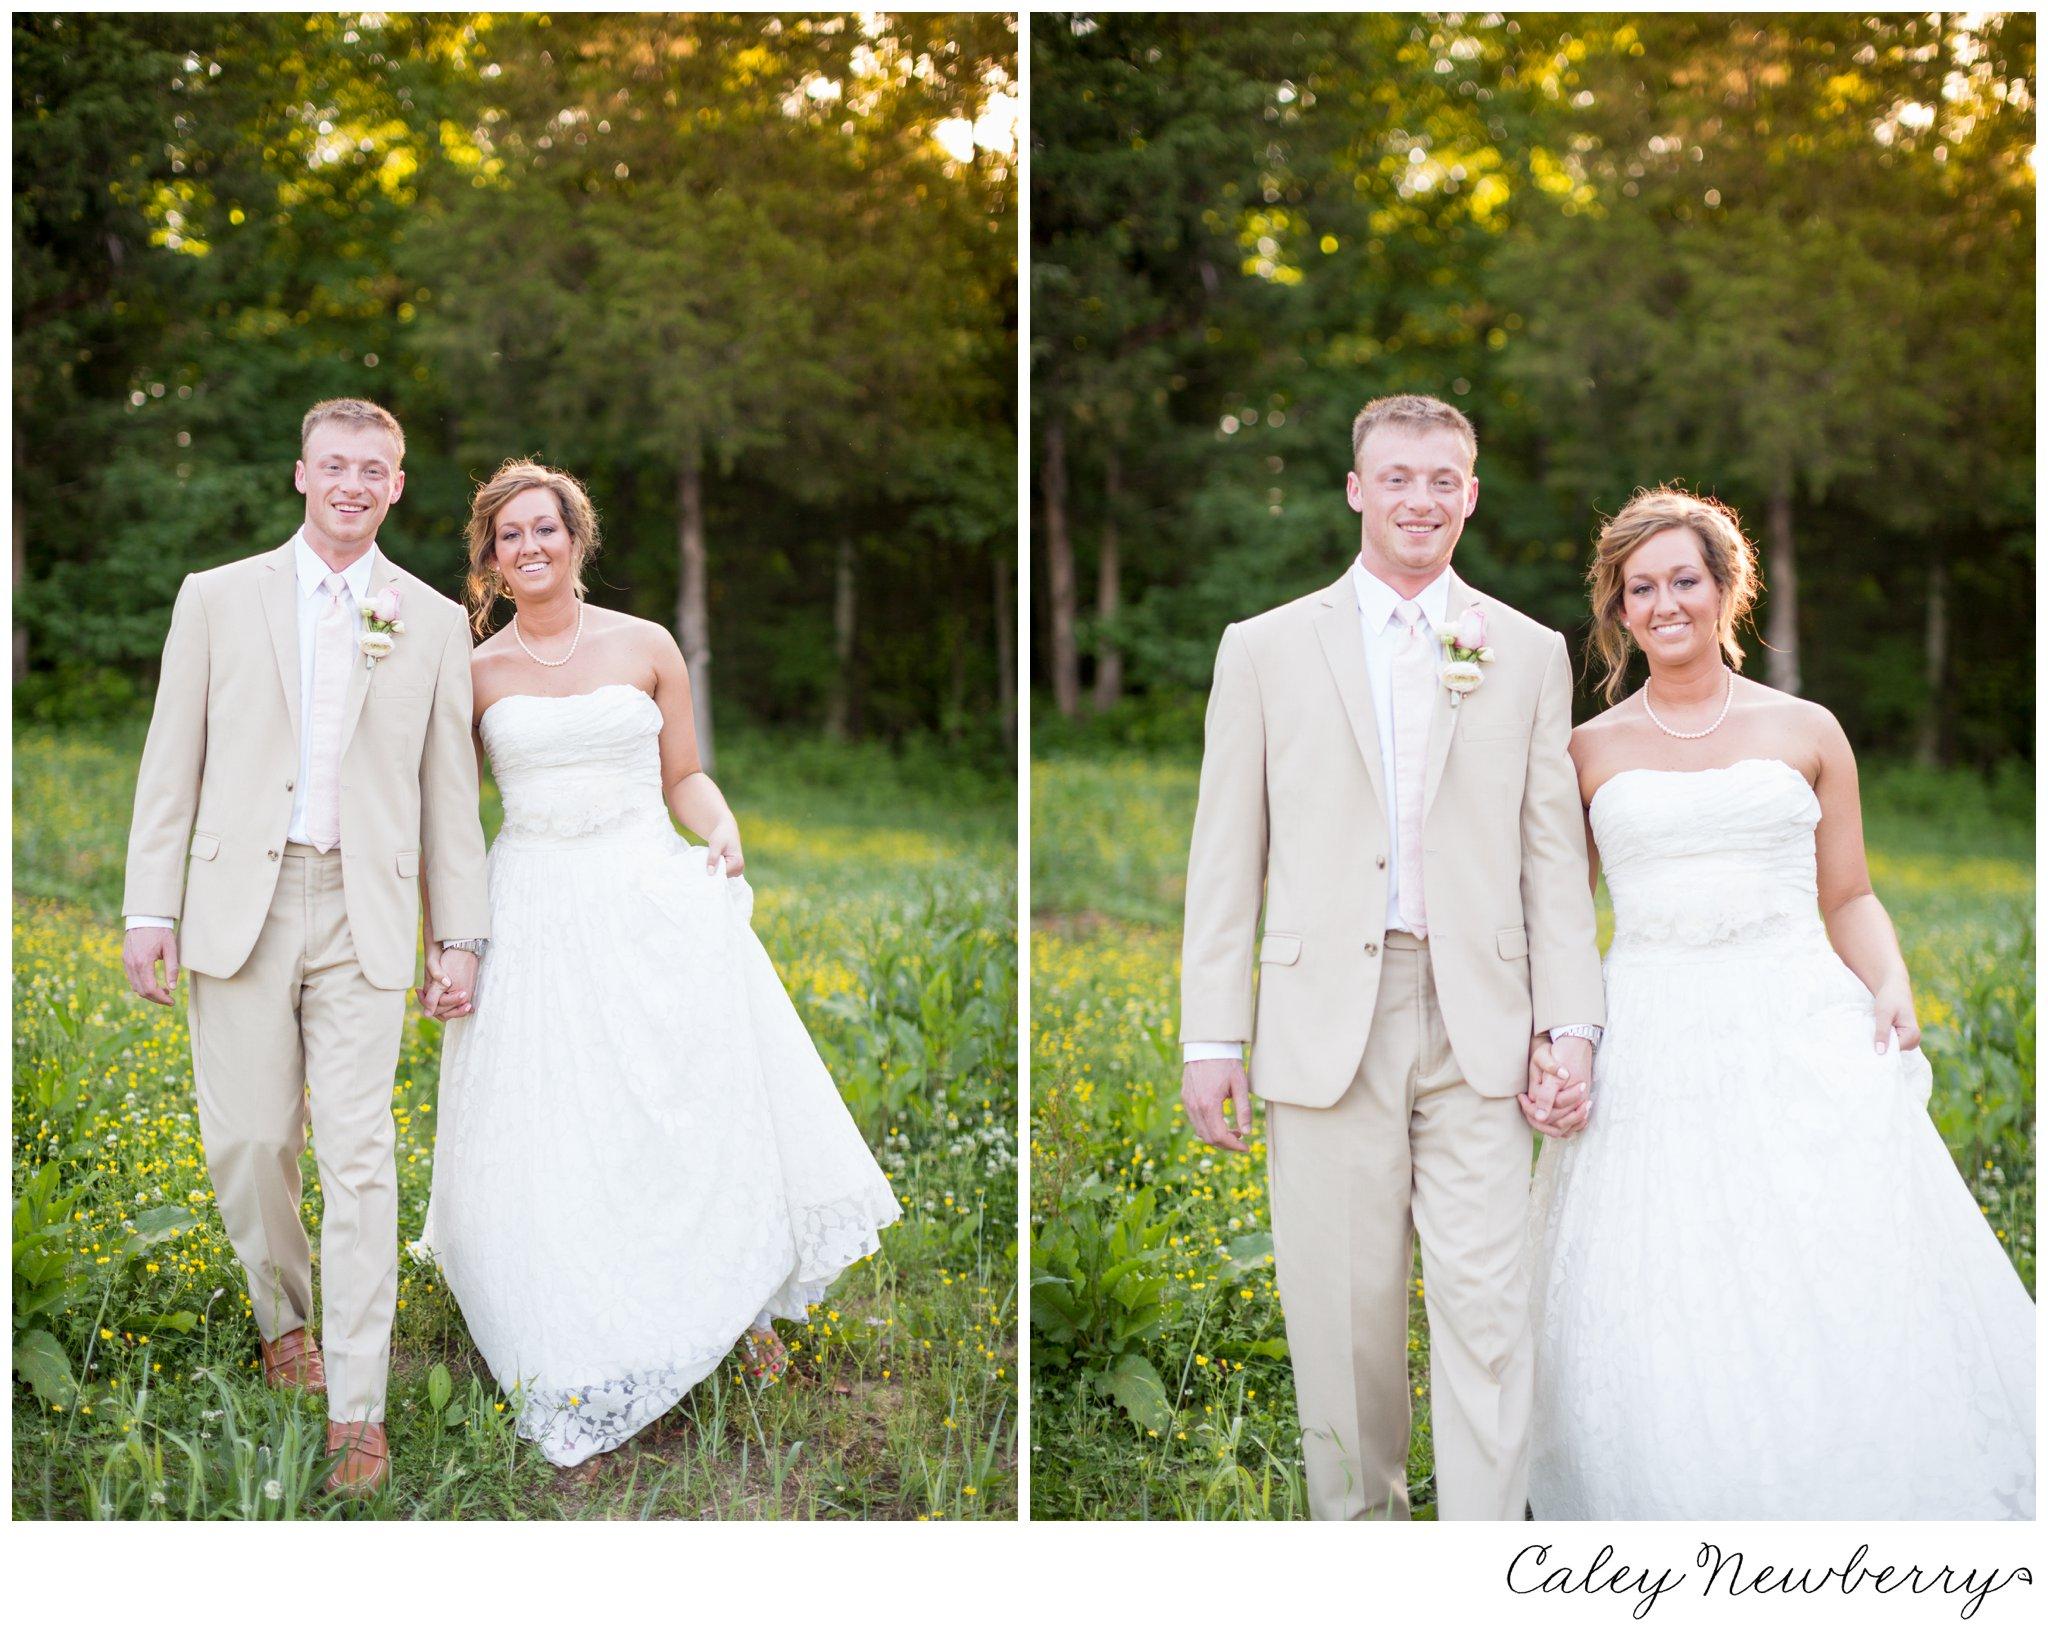 wedding-photographer-nashville-caley-newberry.jpg